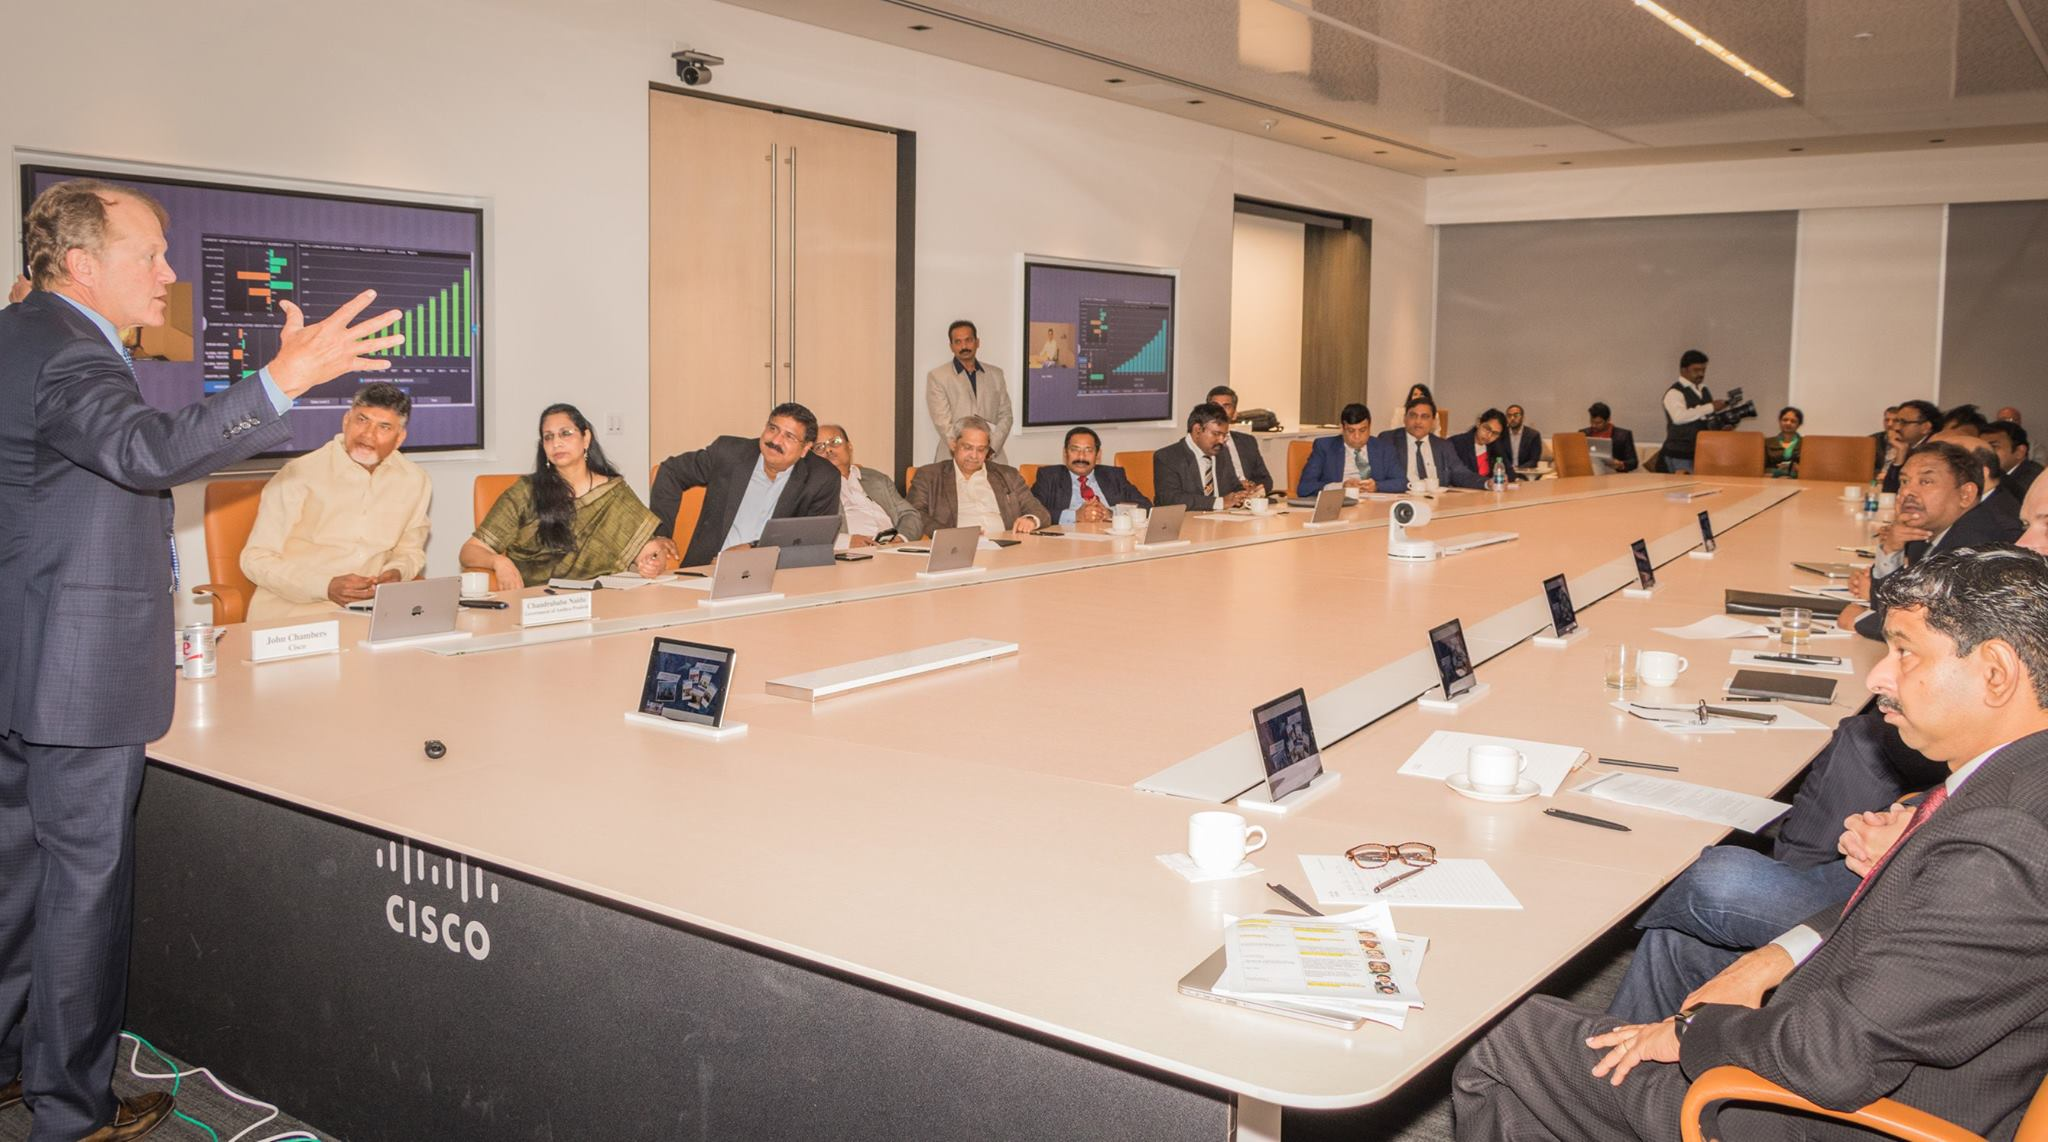 Cisco System chairman John Chambers gives presentation to Andhra Pradesh chief minister N Chandrababu Naidu and Indian IT delegation at Cisco headquarters.